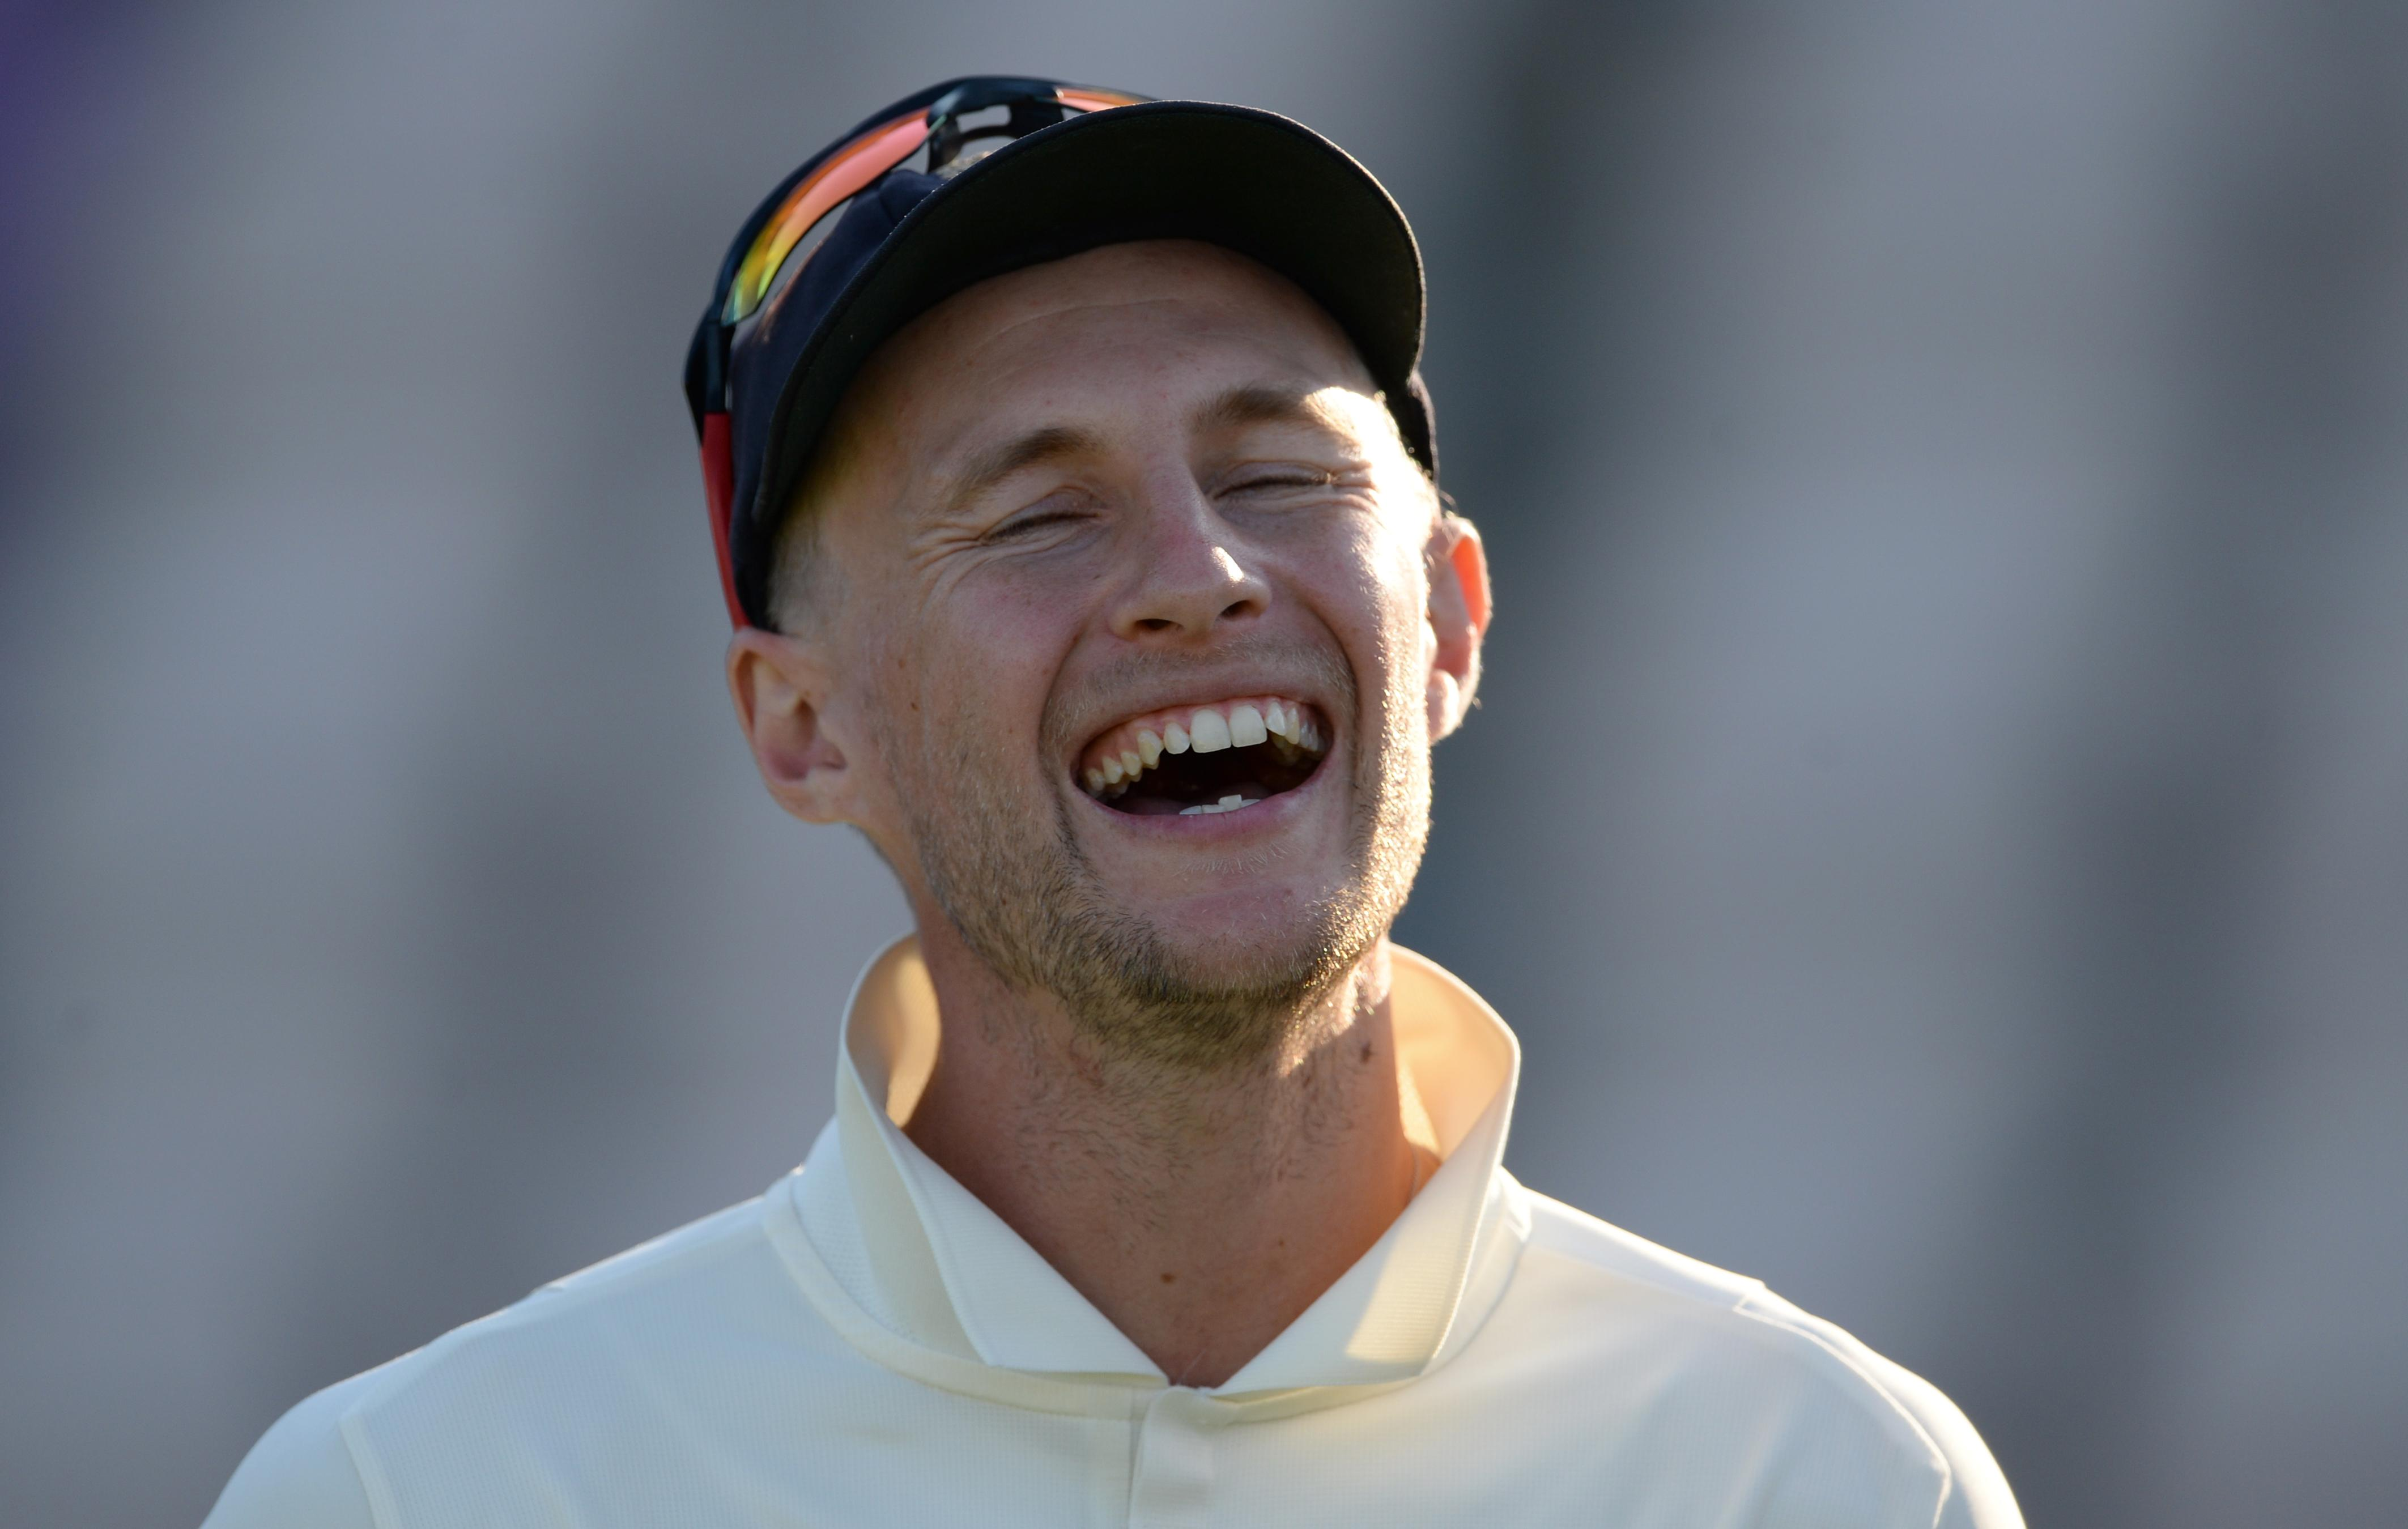 Joe Root has hailed his greatest win as England captain